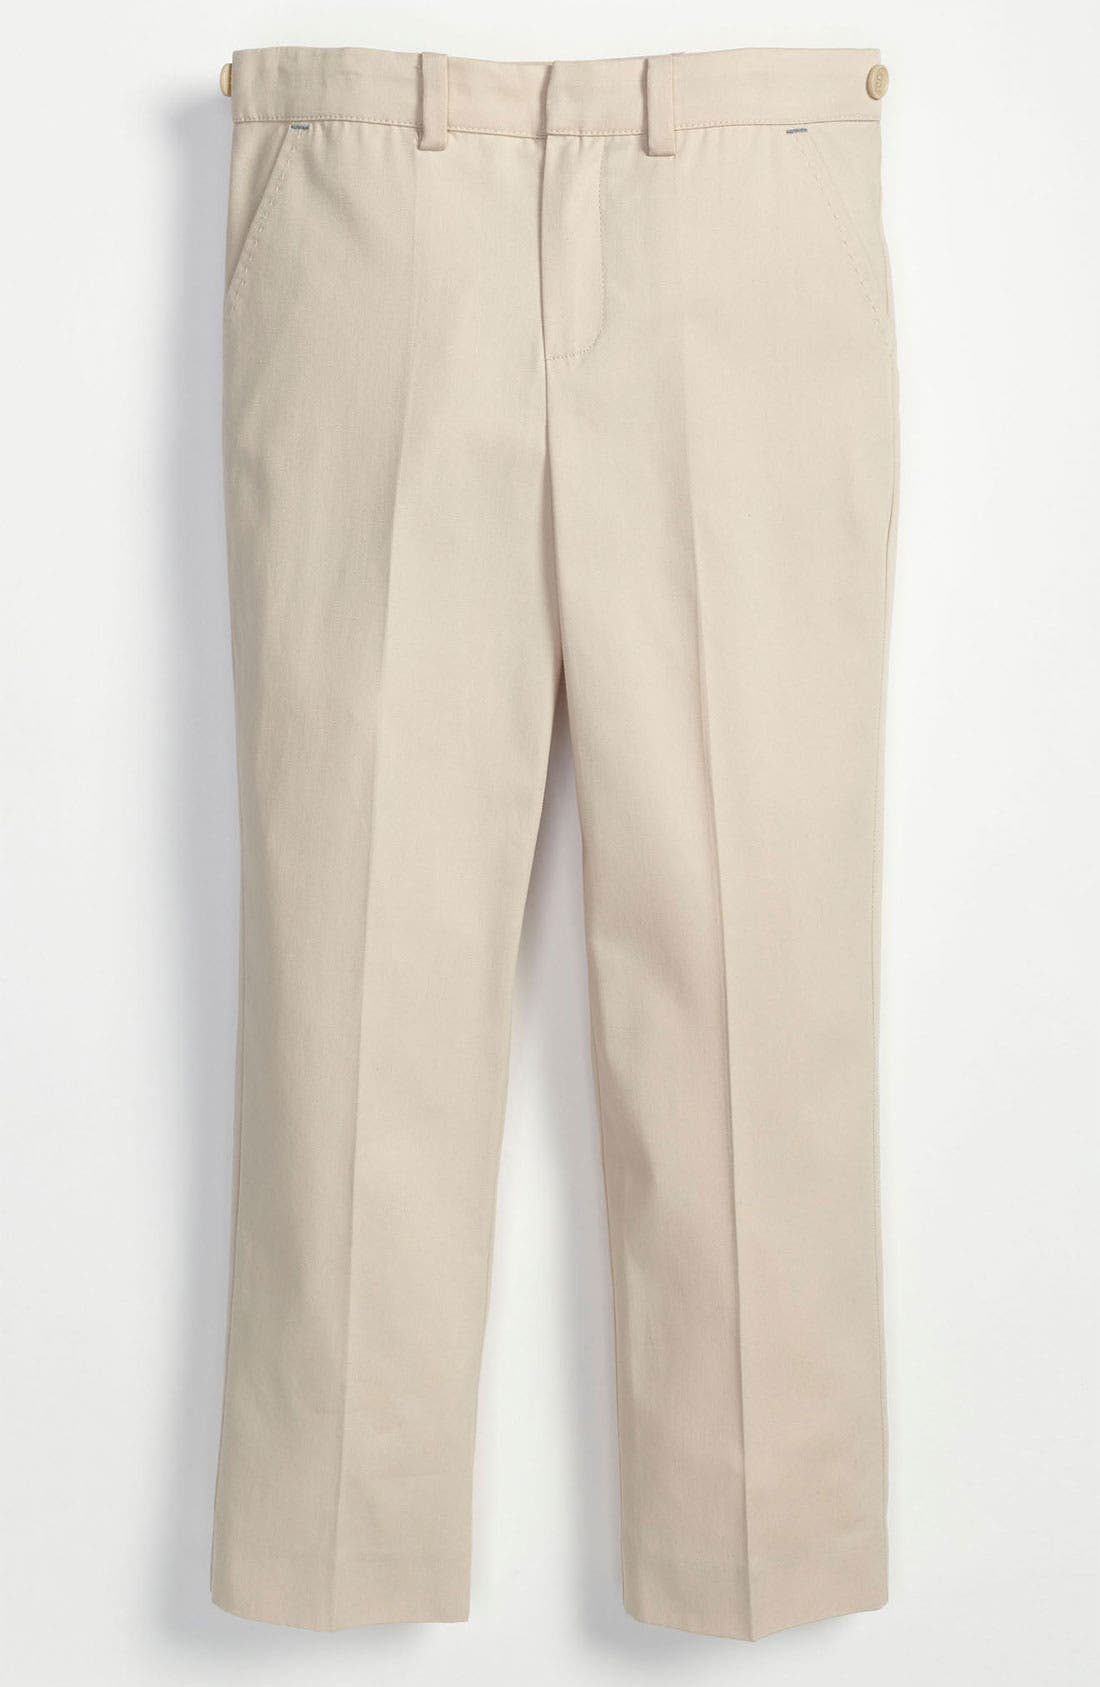 Alternate Image 1 Selected - Paul Smith Junior 'Doyle' Pants (Little Boys & Big Boys)